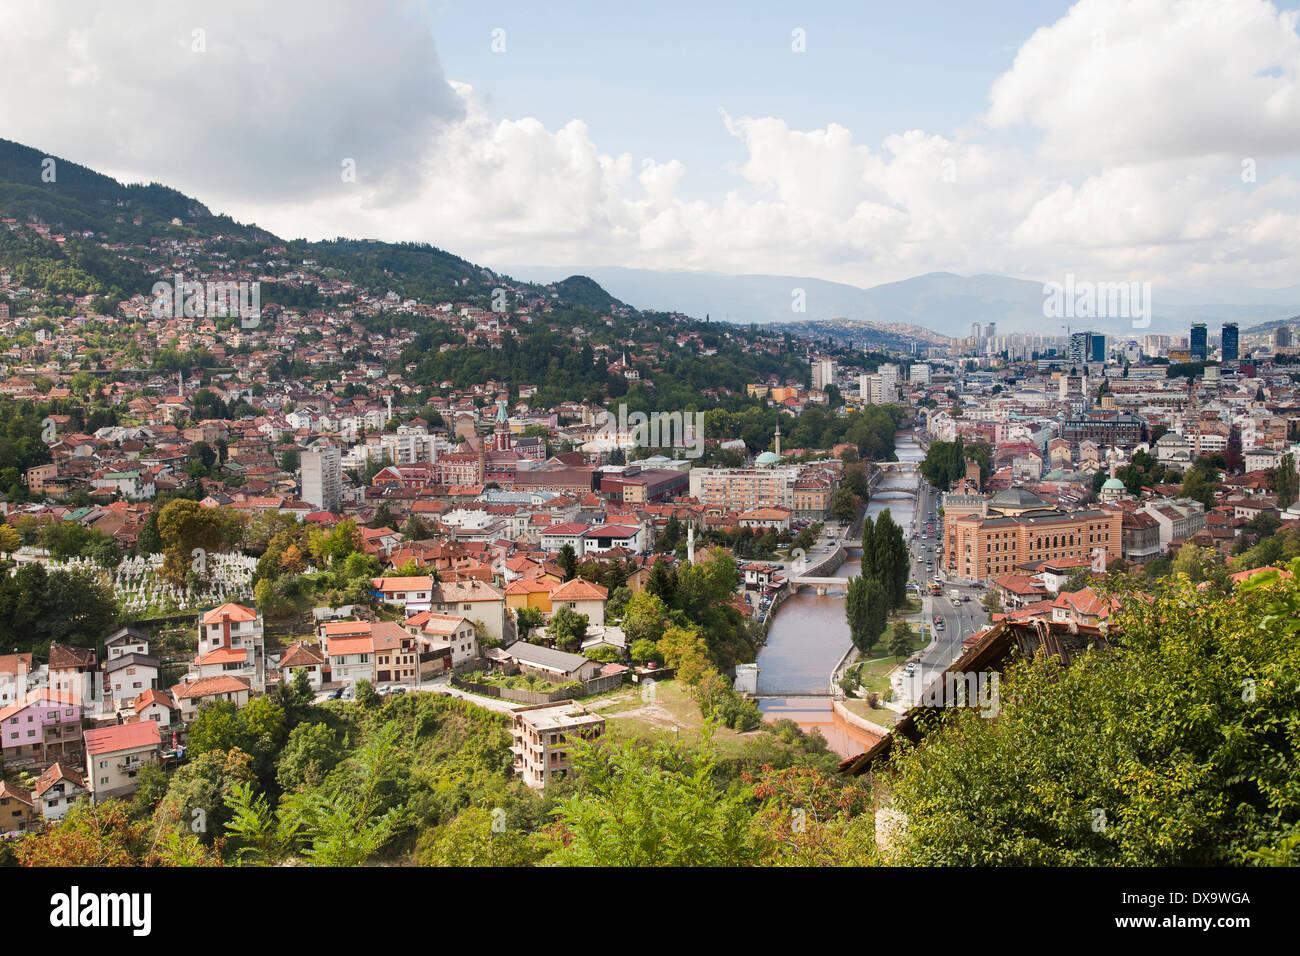 view with miljacka river, sarajevo, bosnia and herzegovina, europe - Stock Image